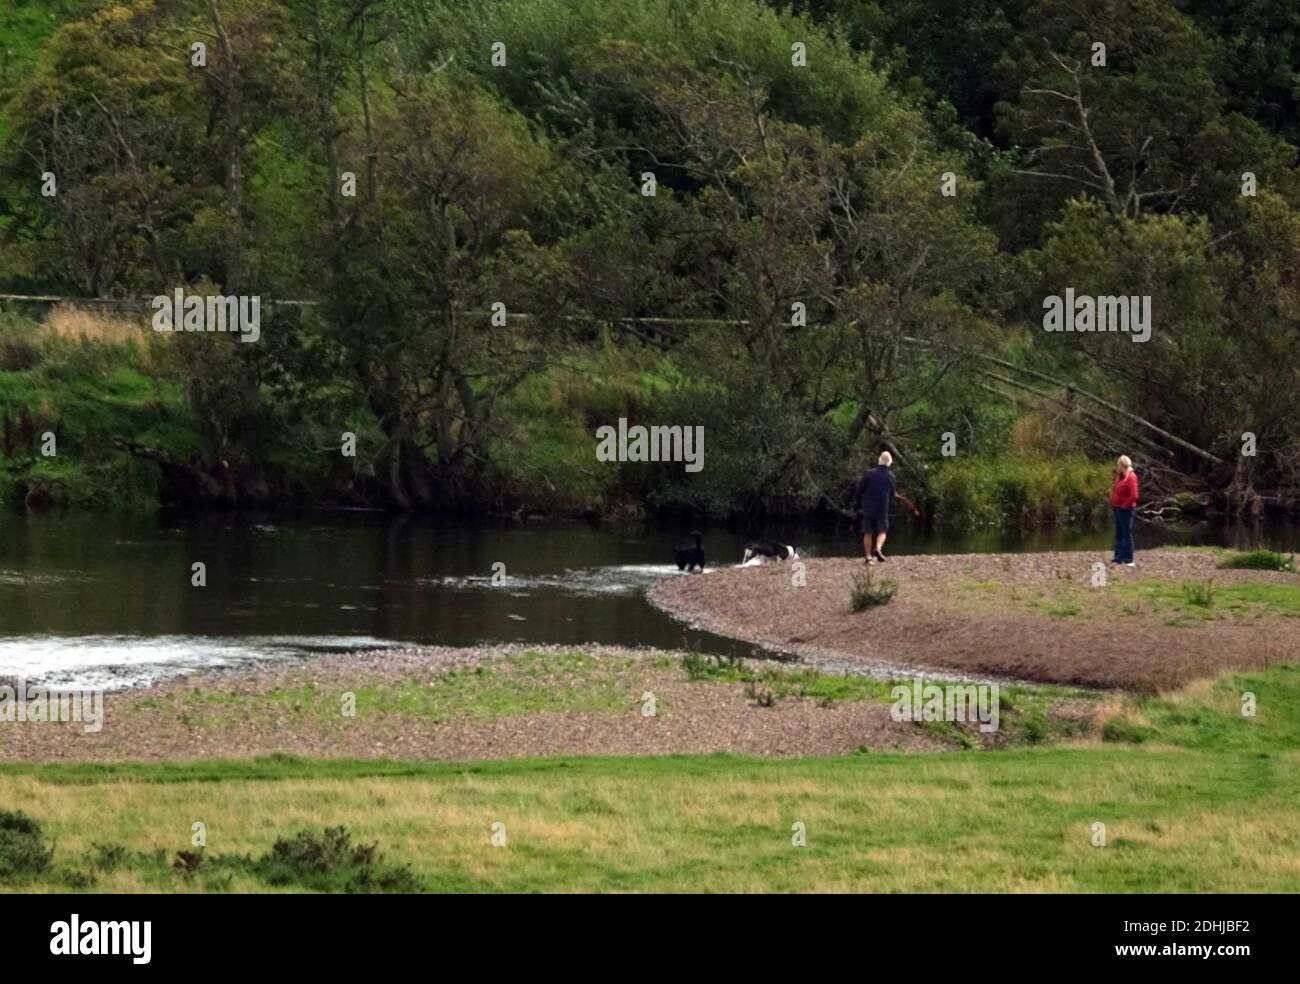 A l'est de Thropton, la rivière serpente lentement vers Rothbury.Samedi 3 octobre 2020. Banque D'Images